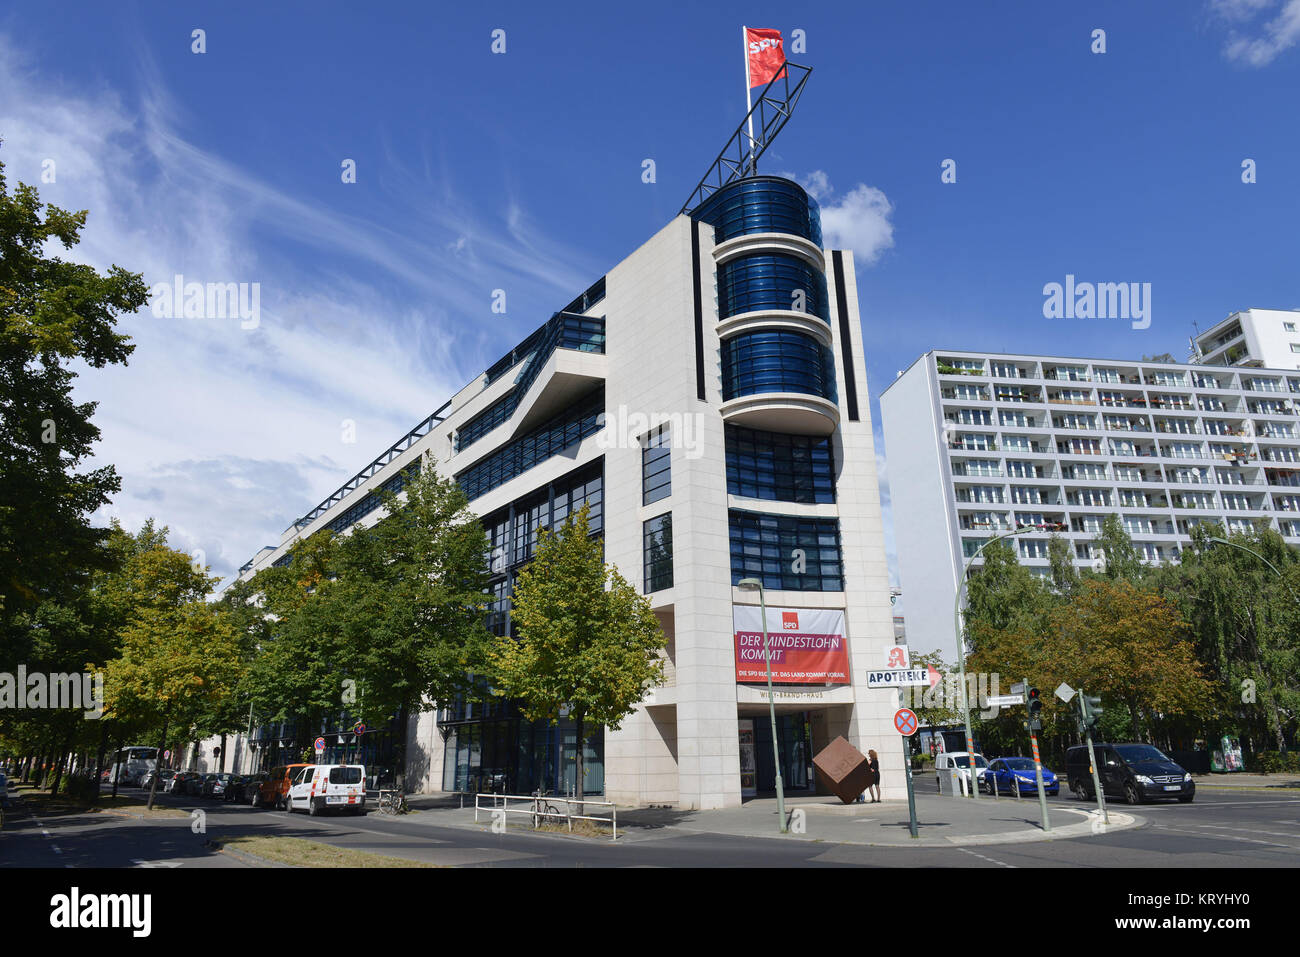 SPD headquarters, Wilhelmstrasse, cross mountain, Berlin, Germany, SPD-Zentrale, Kreuzberg, Deutschland - Stock Image